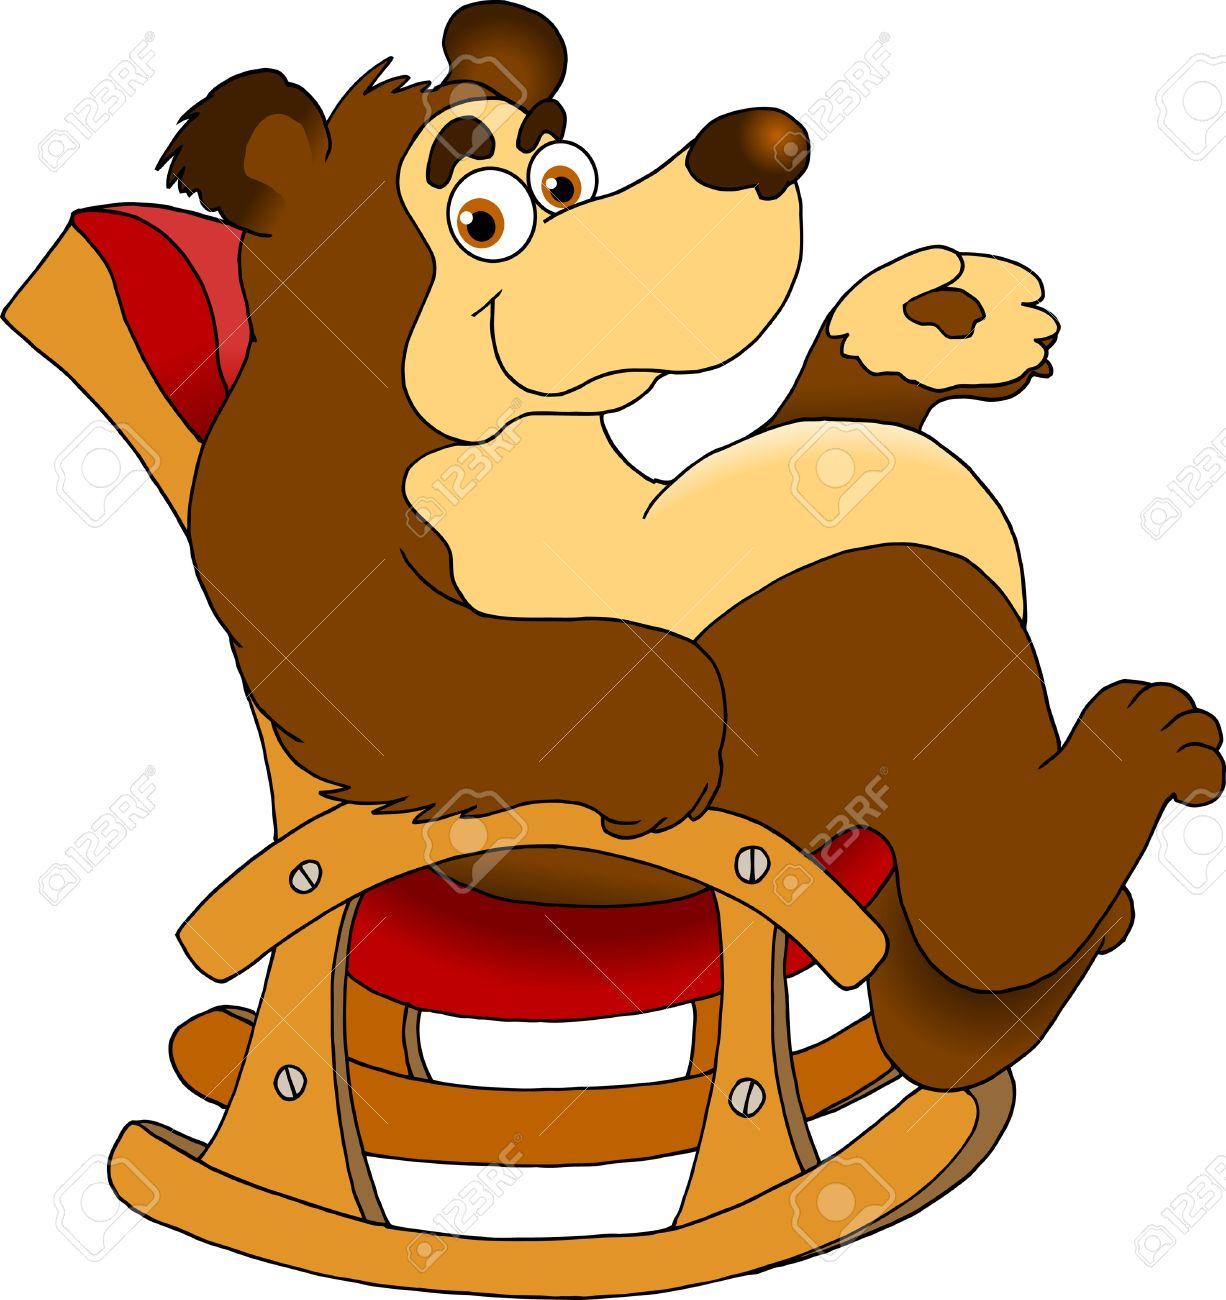 funny bear sitting in a rocking chair  vector illustration ; Standard-Bild - 14481668